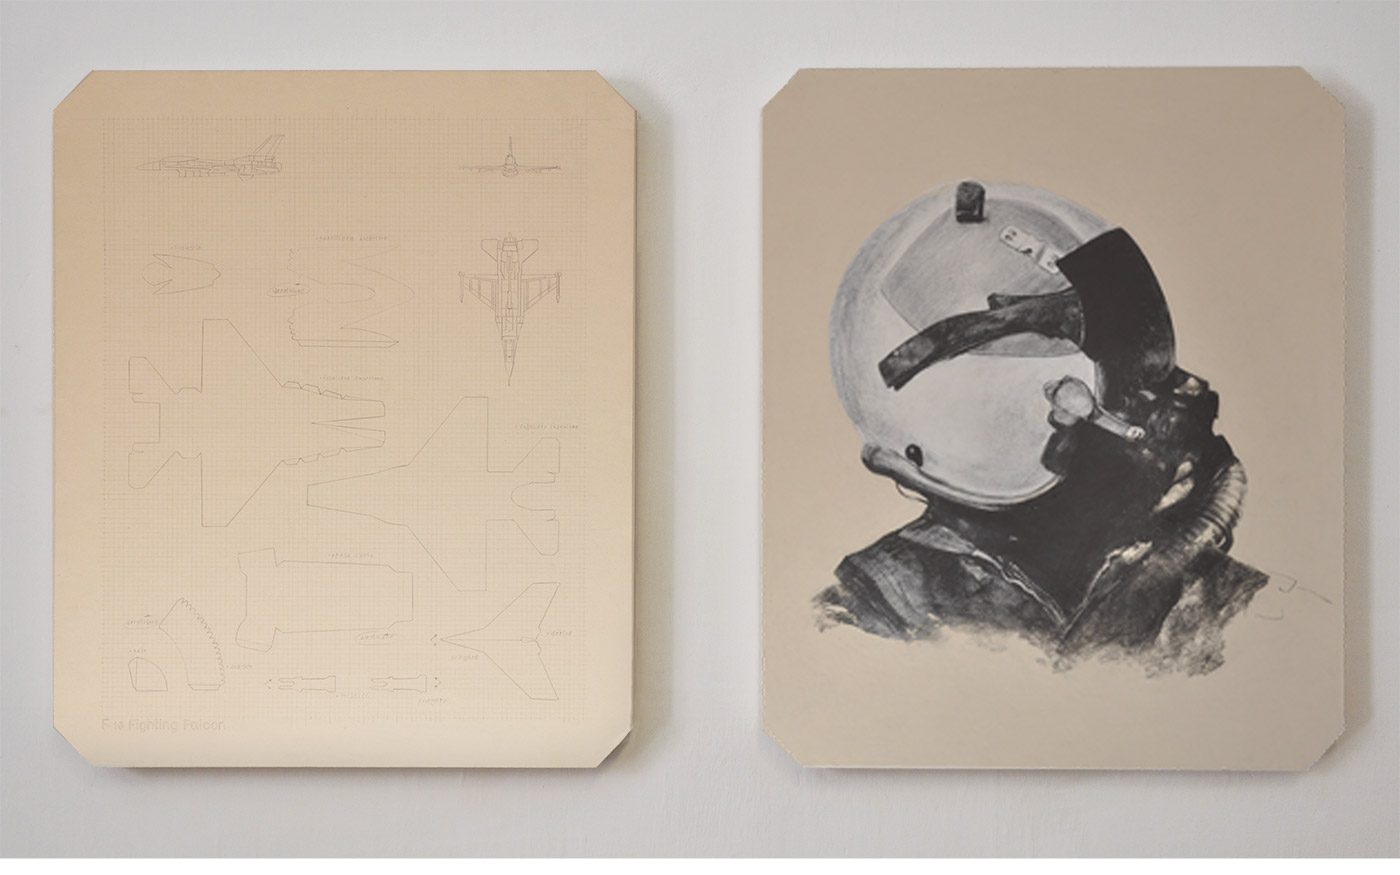 carton plant, graphite, Lascod plaster diptych cm 60 x 72 x 4,5 cad. 2011